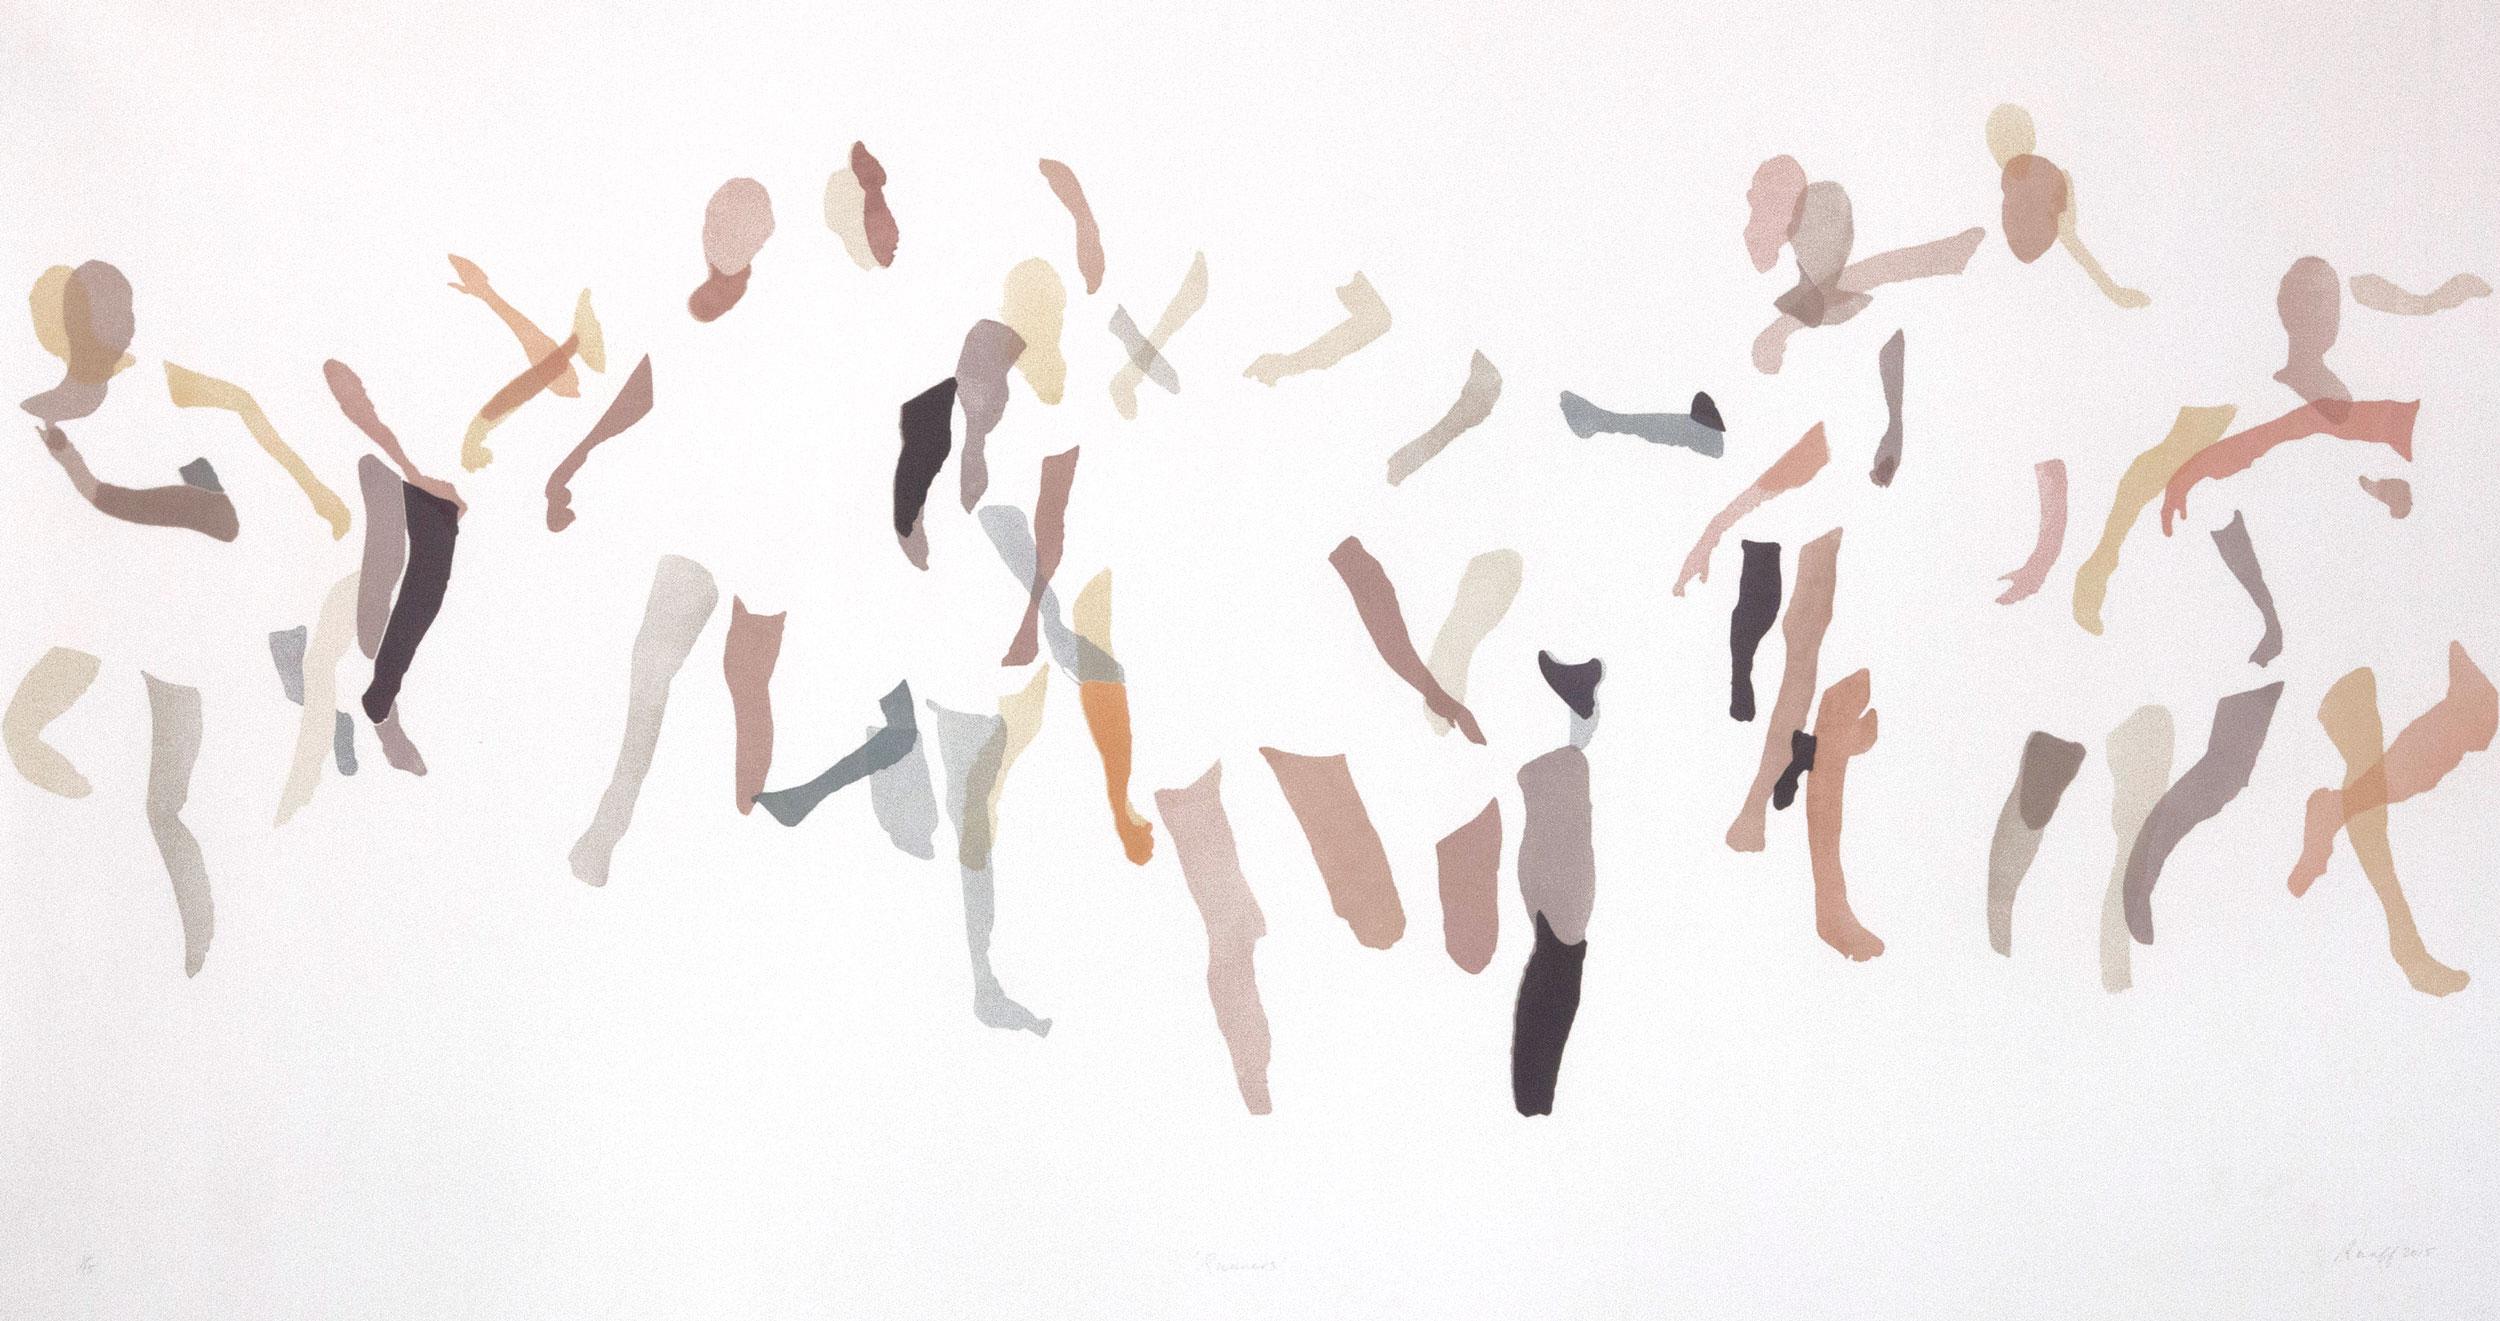 GabbyRaaff_PP1-Runners-L16sfweb